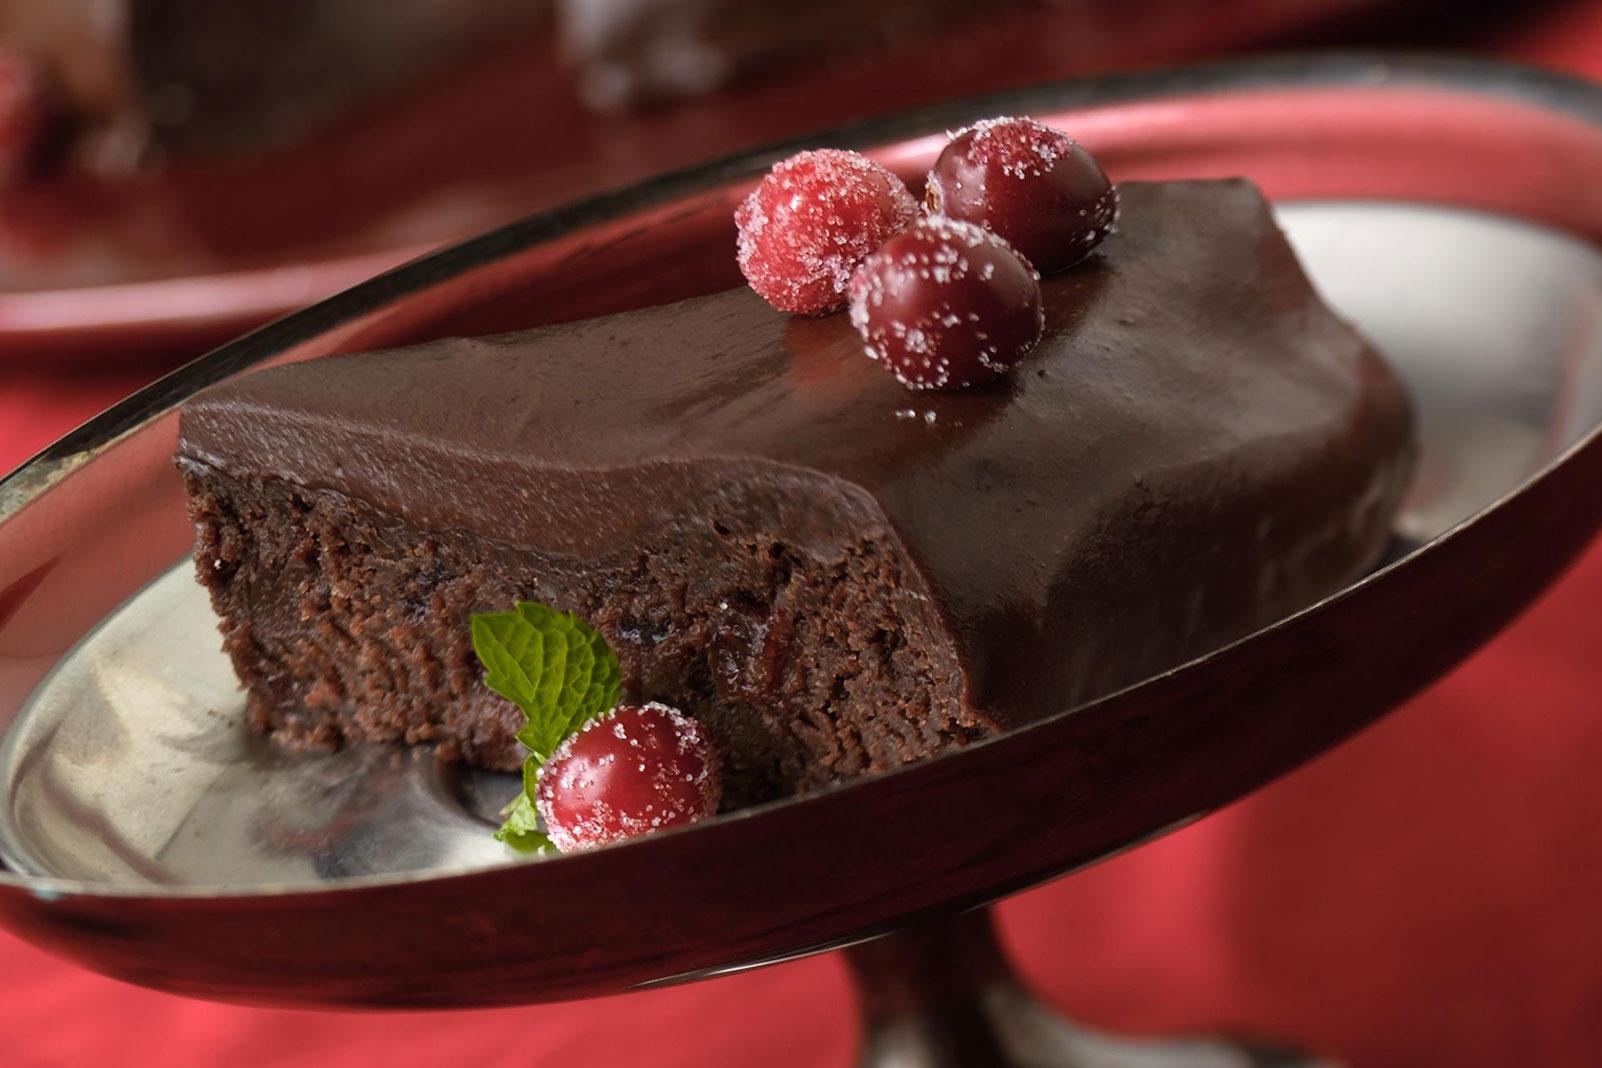 Outrageous Chocolate Cranberry Fudge Cake